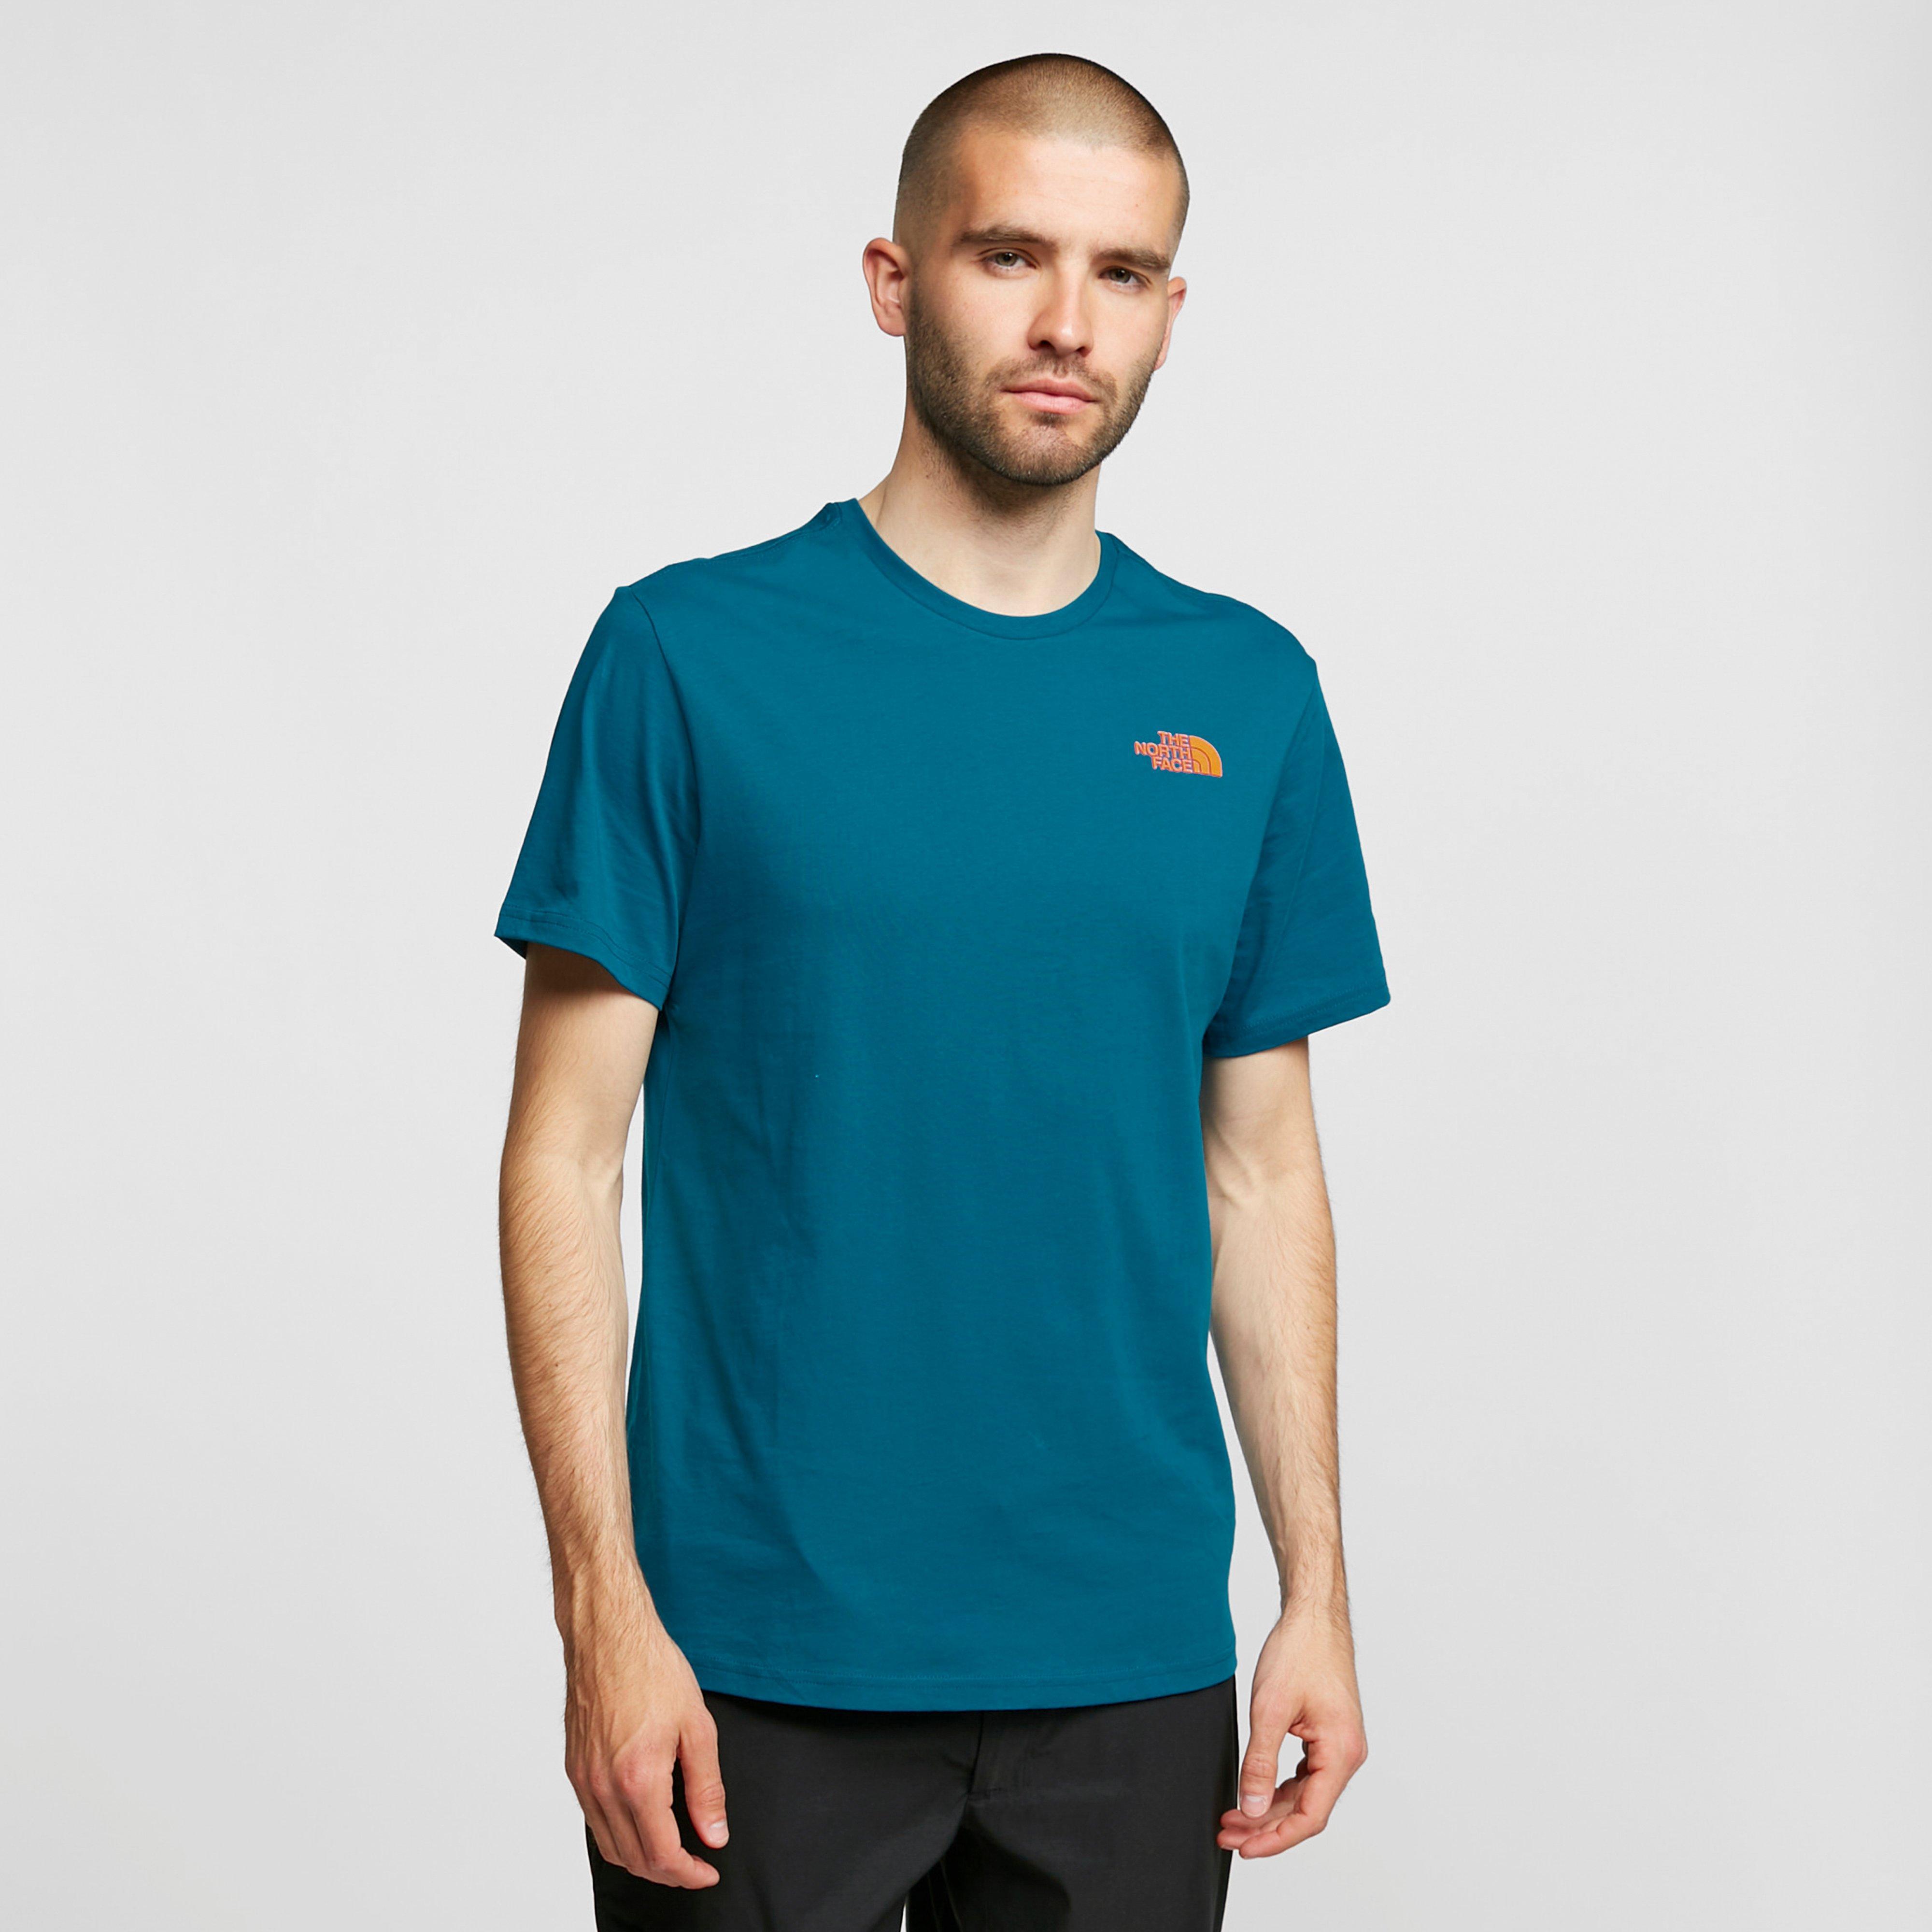 The North Face Mens Biner 3 T-shirt - Blue/dbl  Blue/dbl